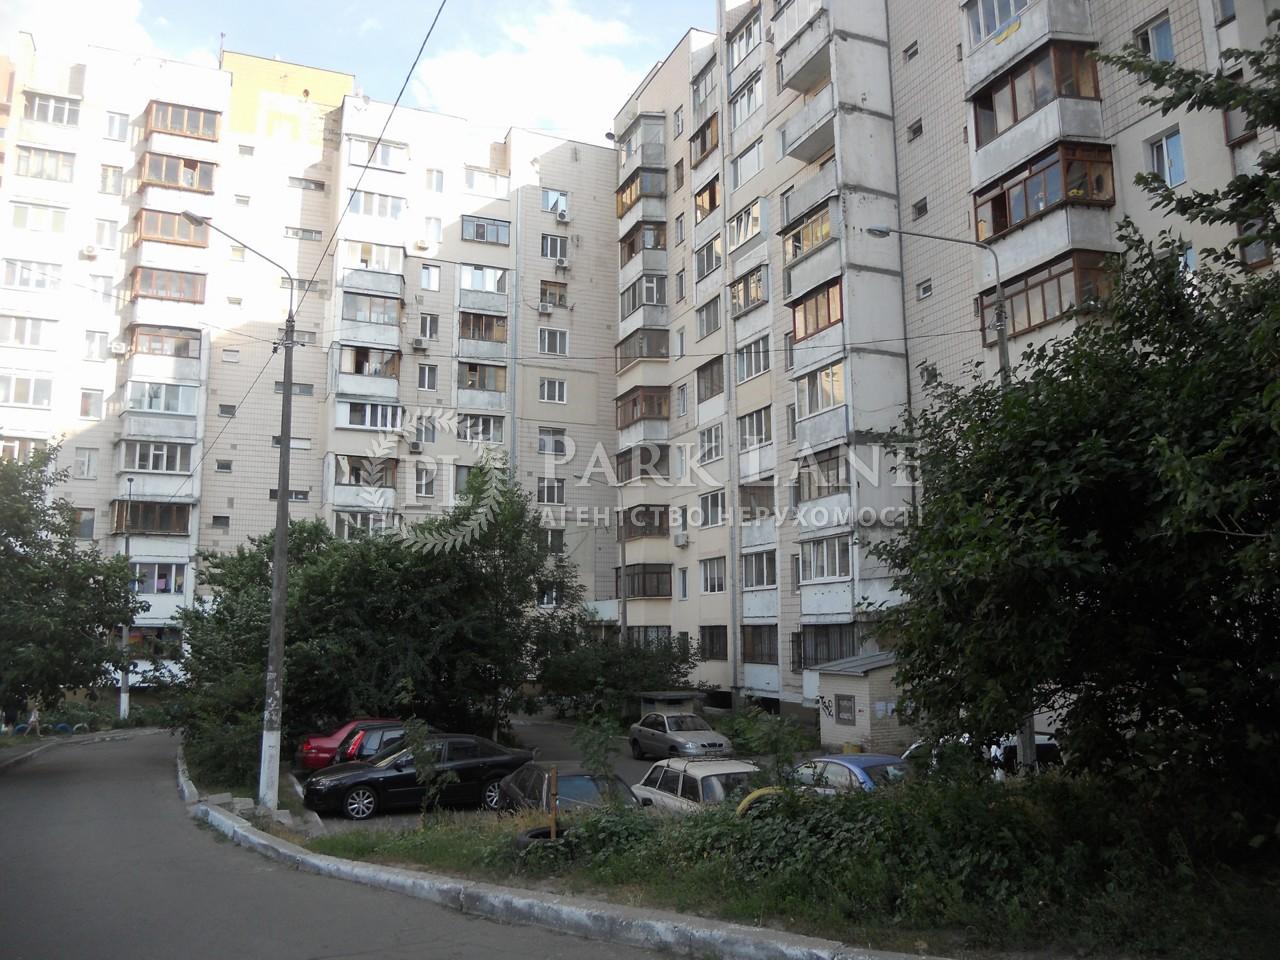 Квартира Моторный пер., 5/7, Киев, L-27739 - Фото 1